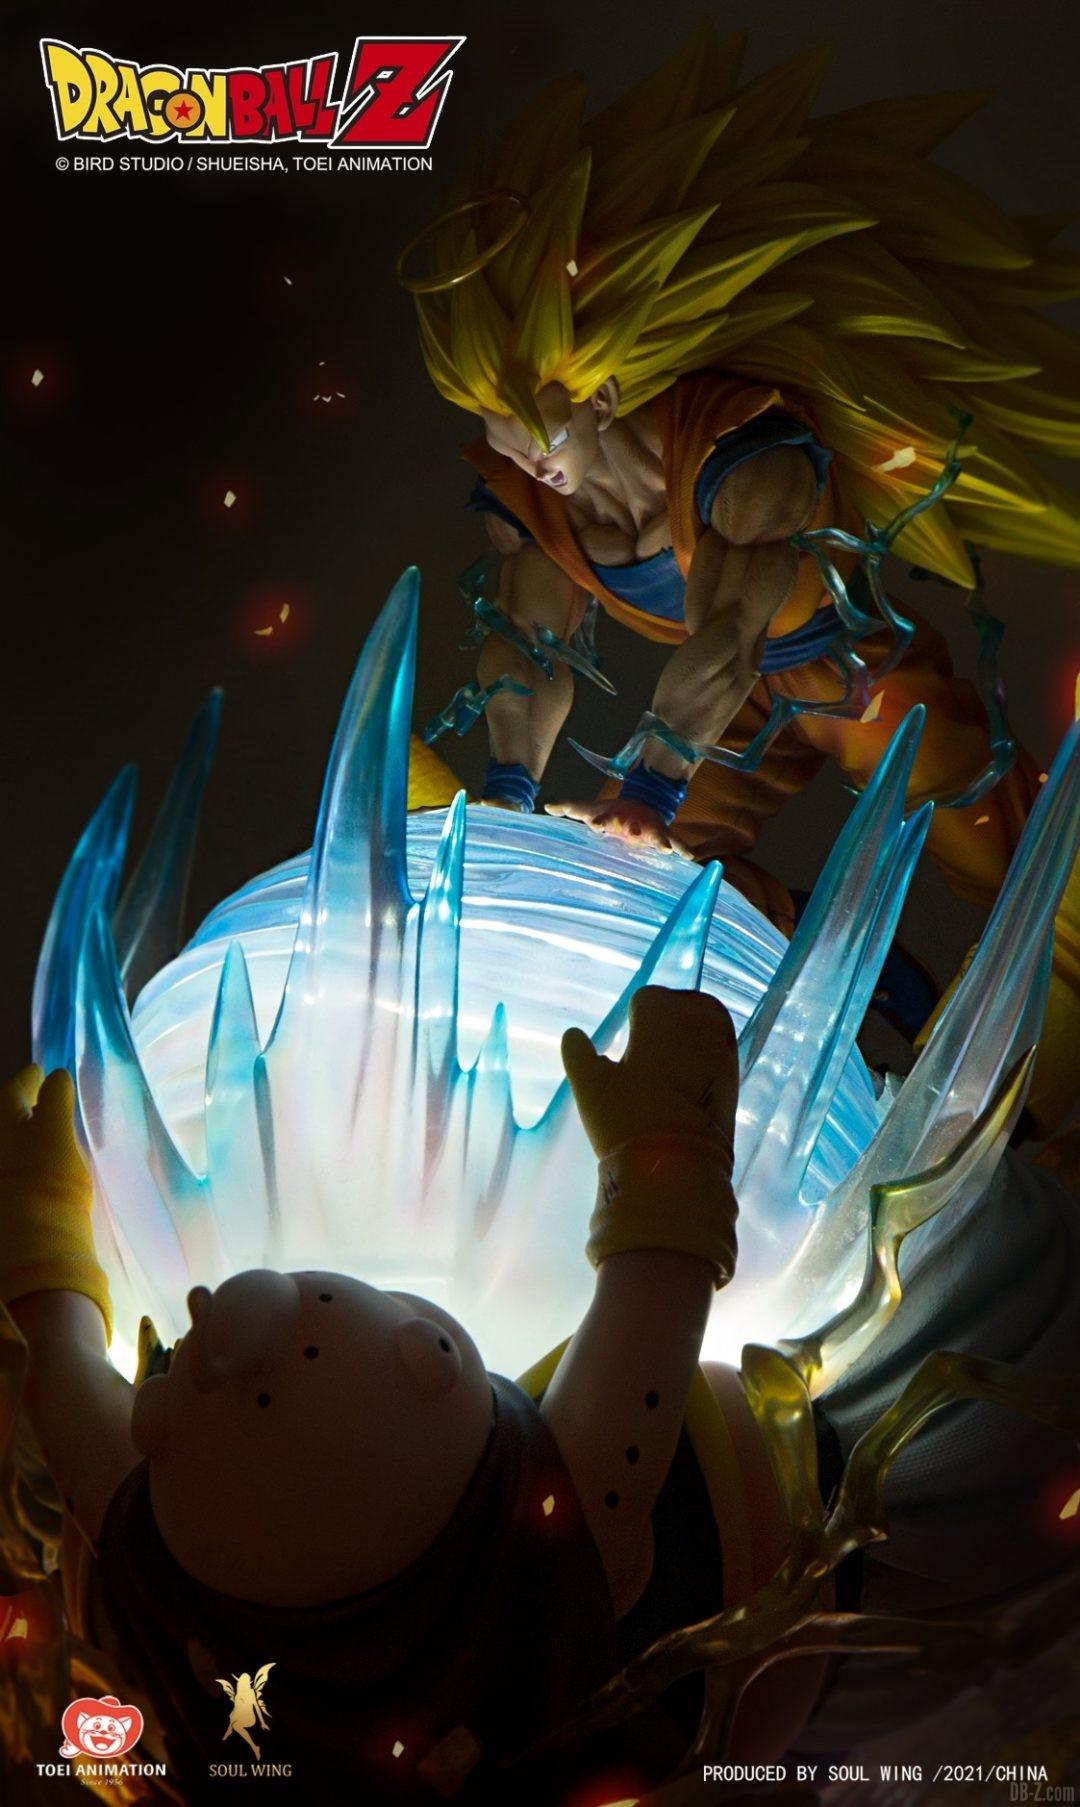 Goku-Super-Saiyan-3-vs-Buu-Soul-Wing-Image-2